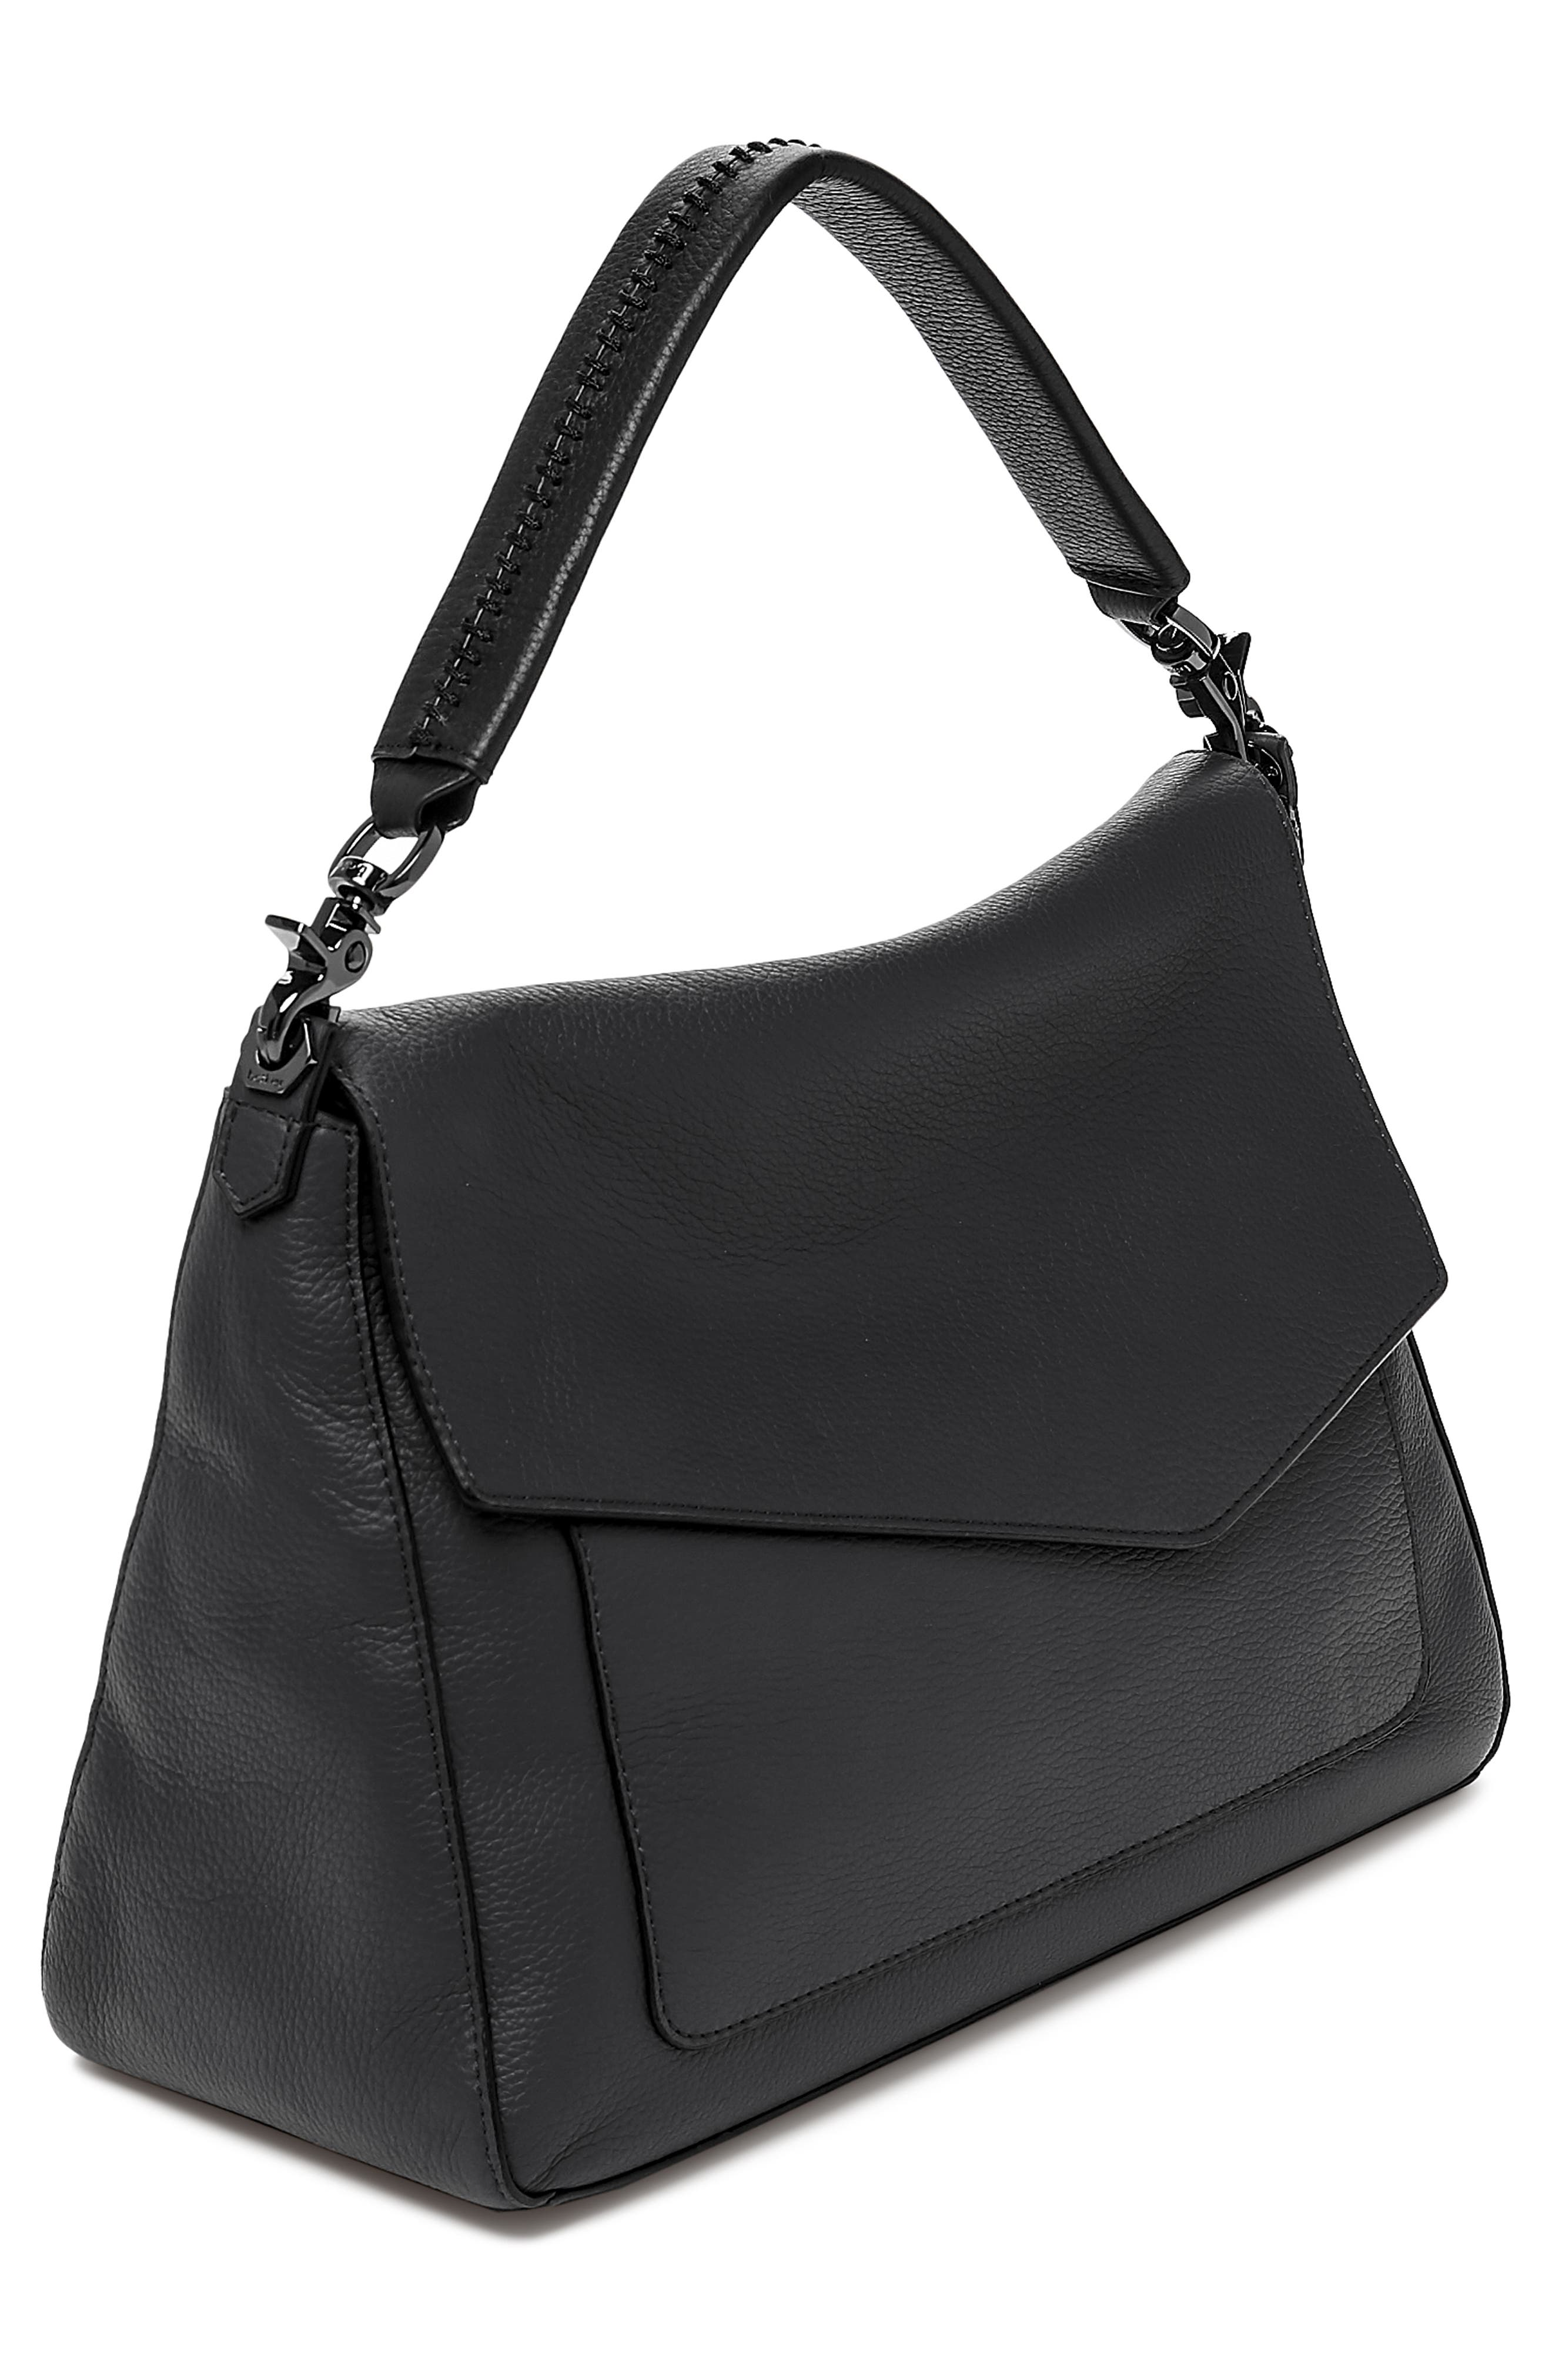 Cobble Hill Slouch Calfskin Leather Hobo,                             Alternate thumbnail 3, color,                             BLACK